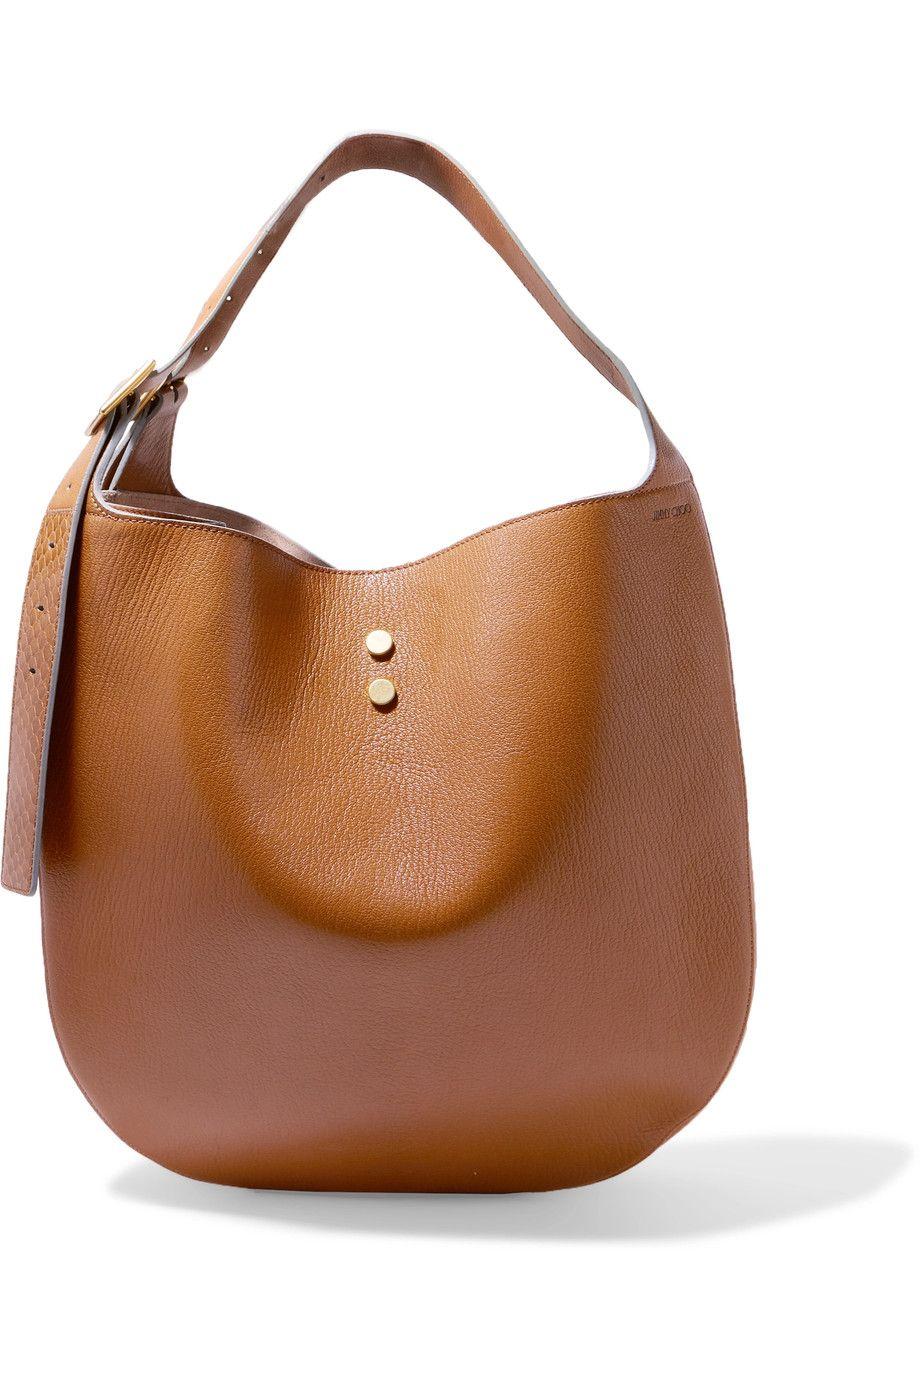 Discount Elaphe shoulder bag - Blue Jimmy Choo London Online Sale Where Can You Find 1kjp8wW